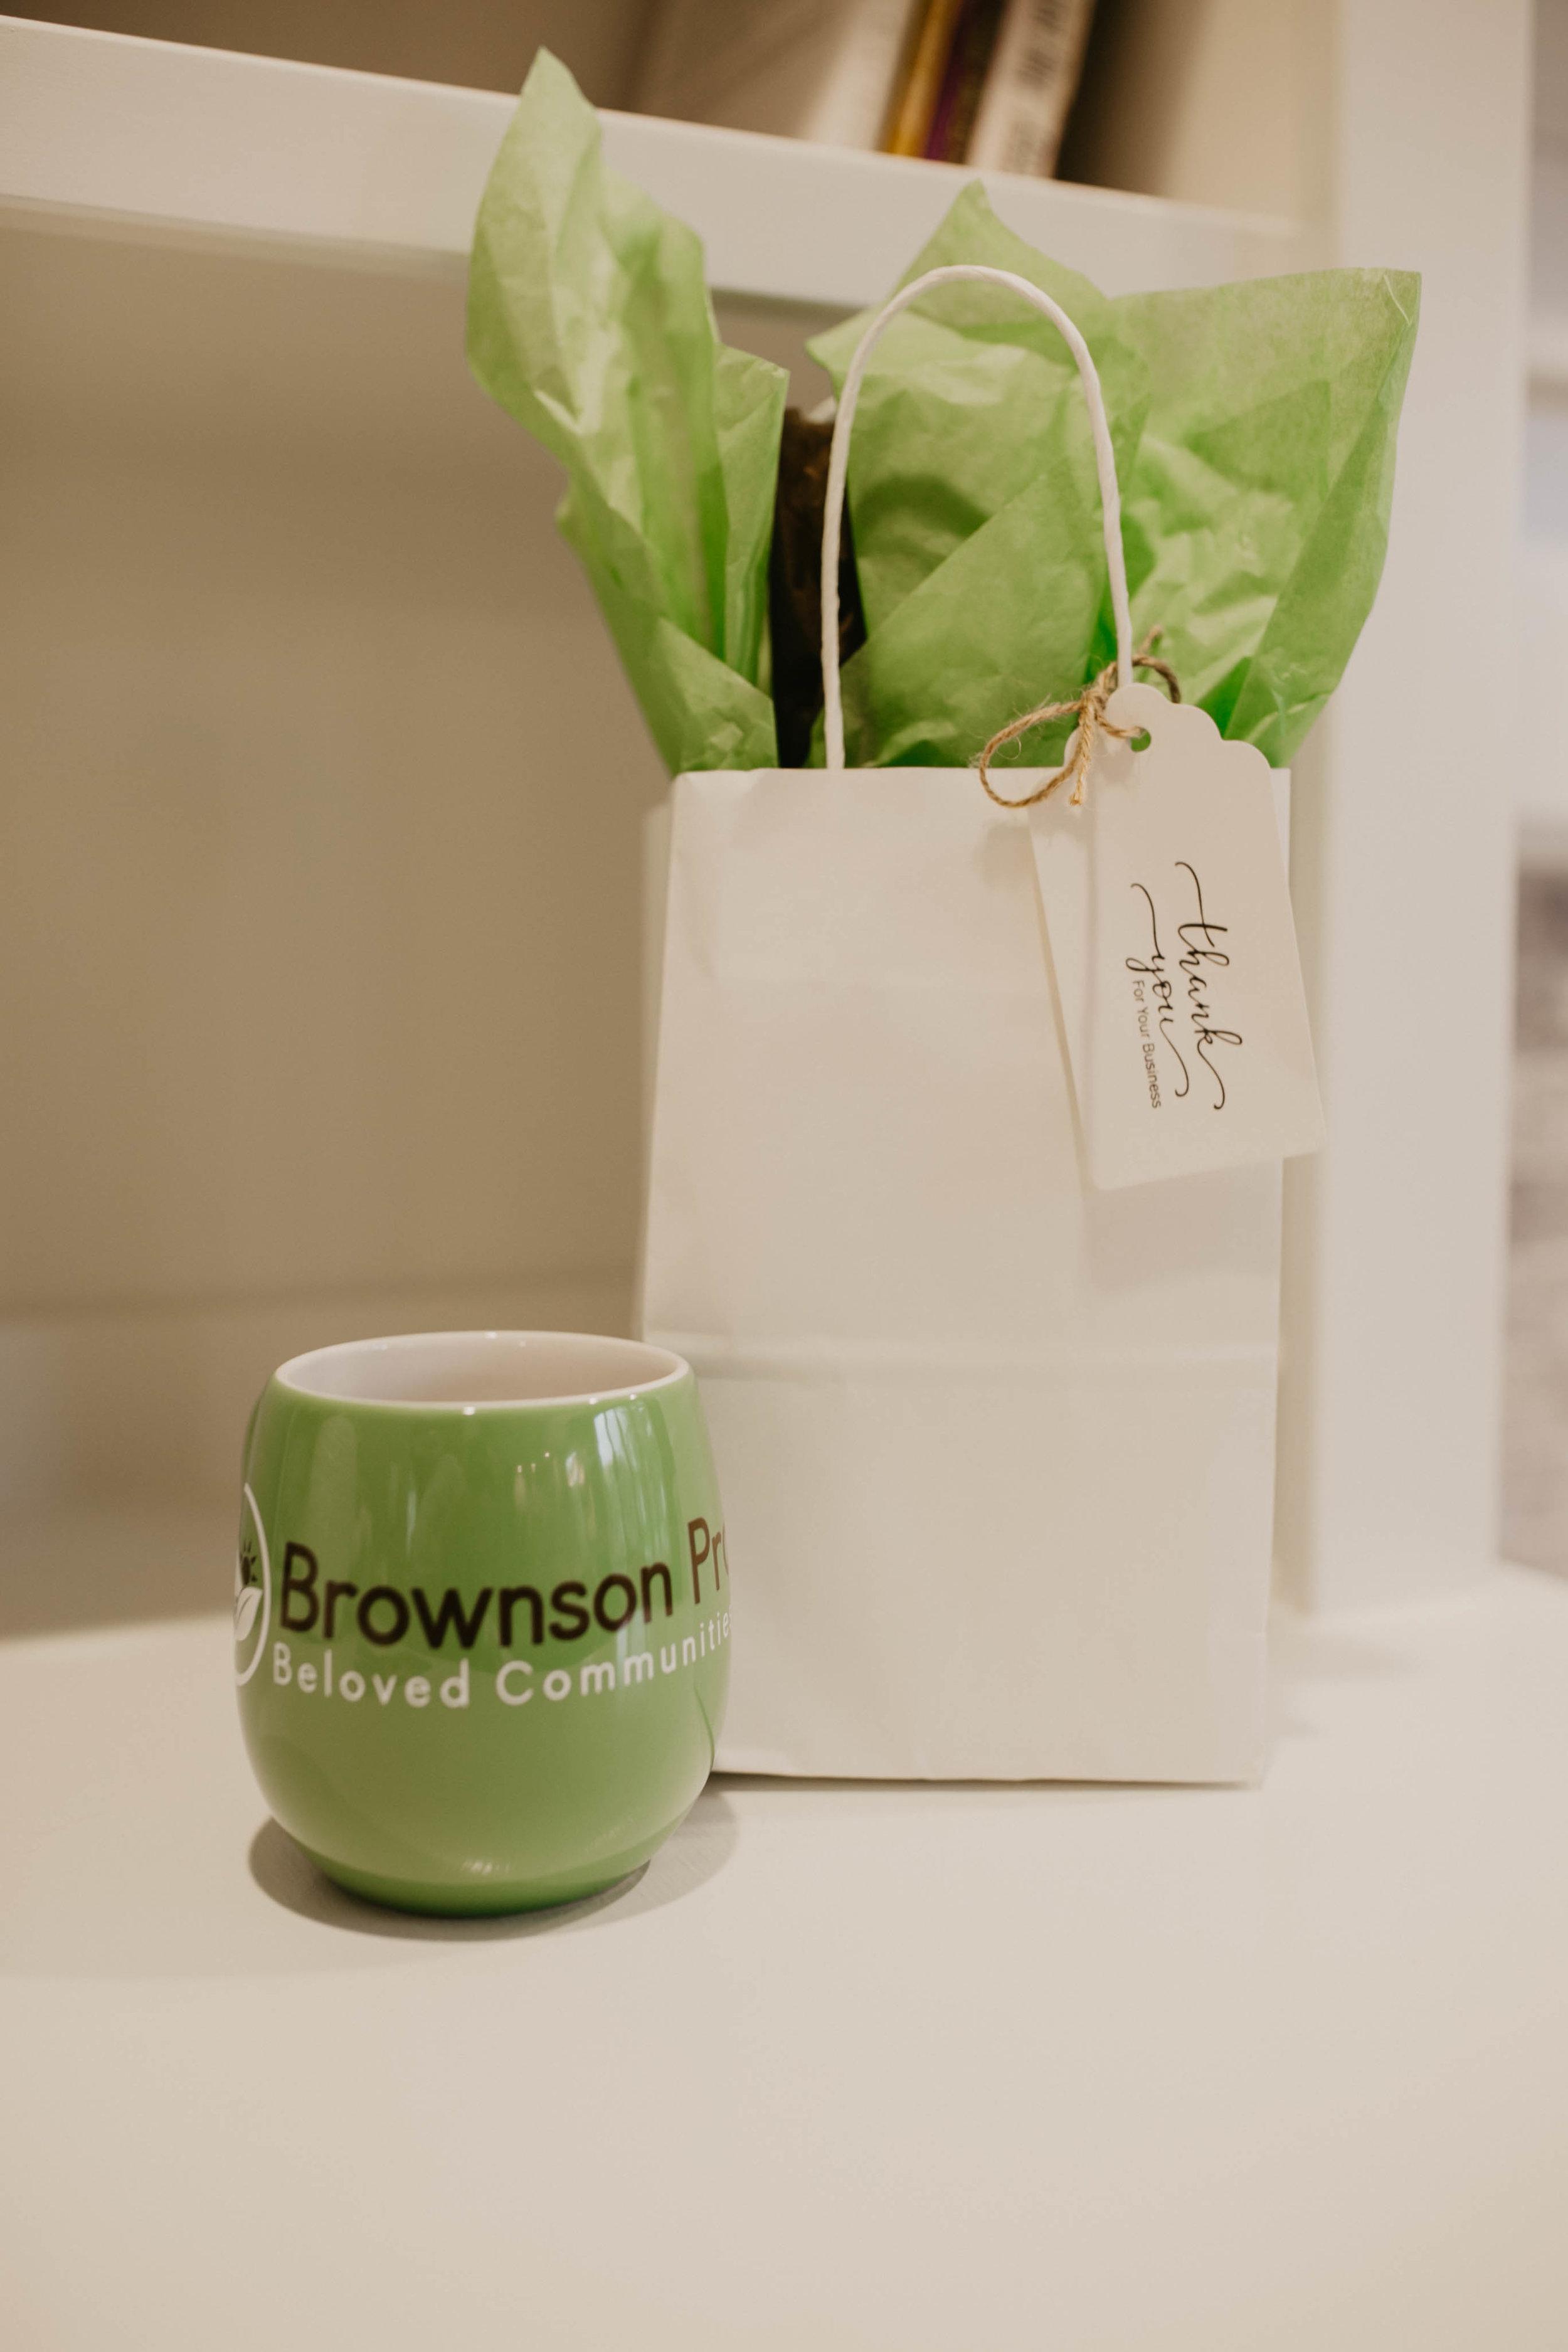 brownson.jpg